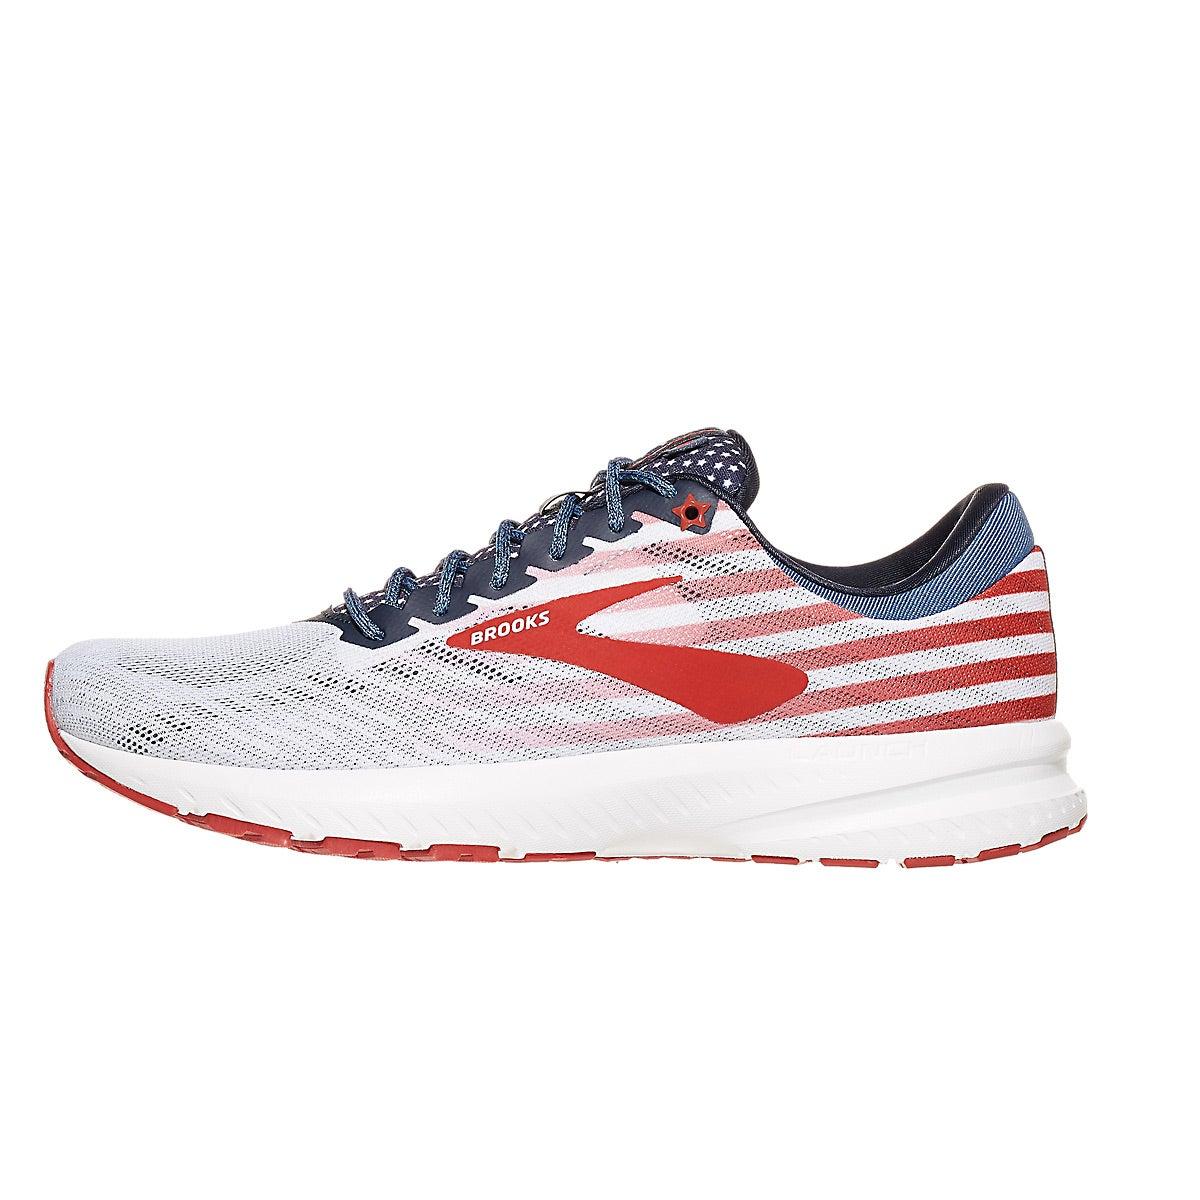 Brooks Launch 6 Women's Shoes Go USA